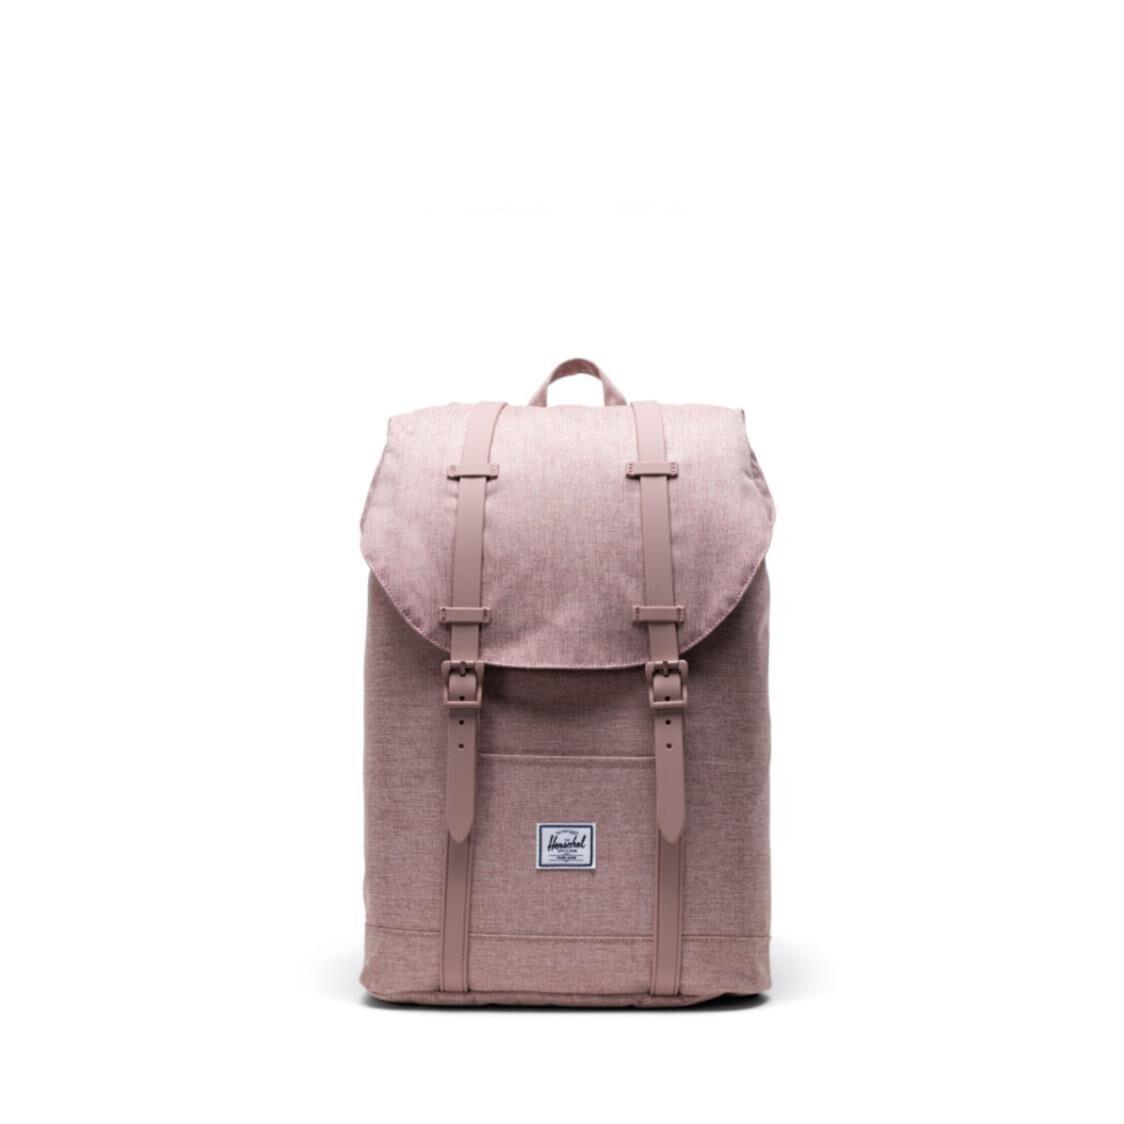 Herschel Retreat Mid-Volume RetreatAsh Rose Crosshatch Backpack 10329-04885-OS